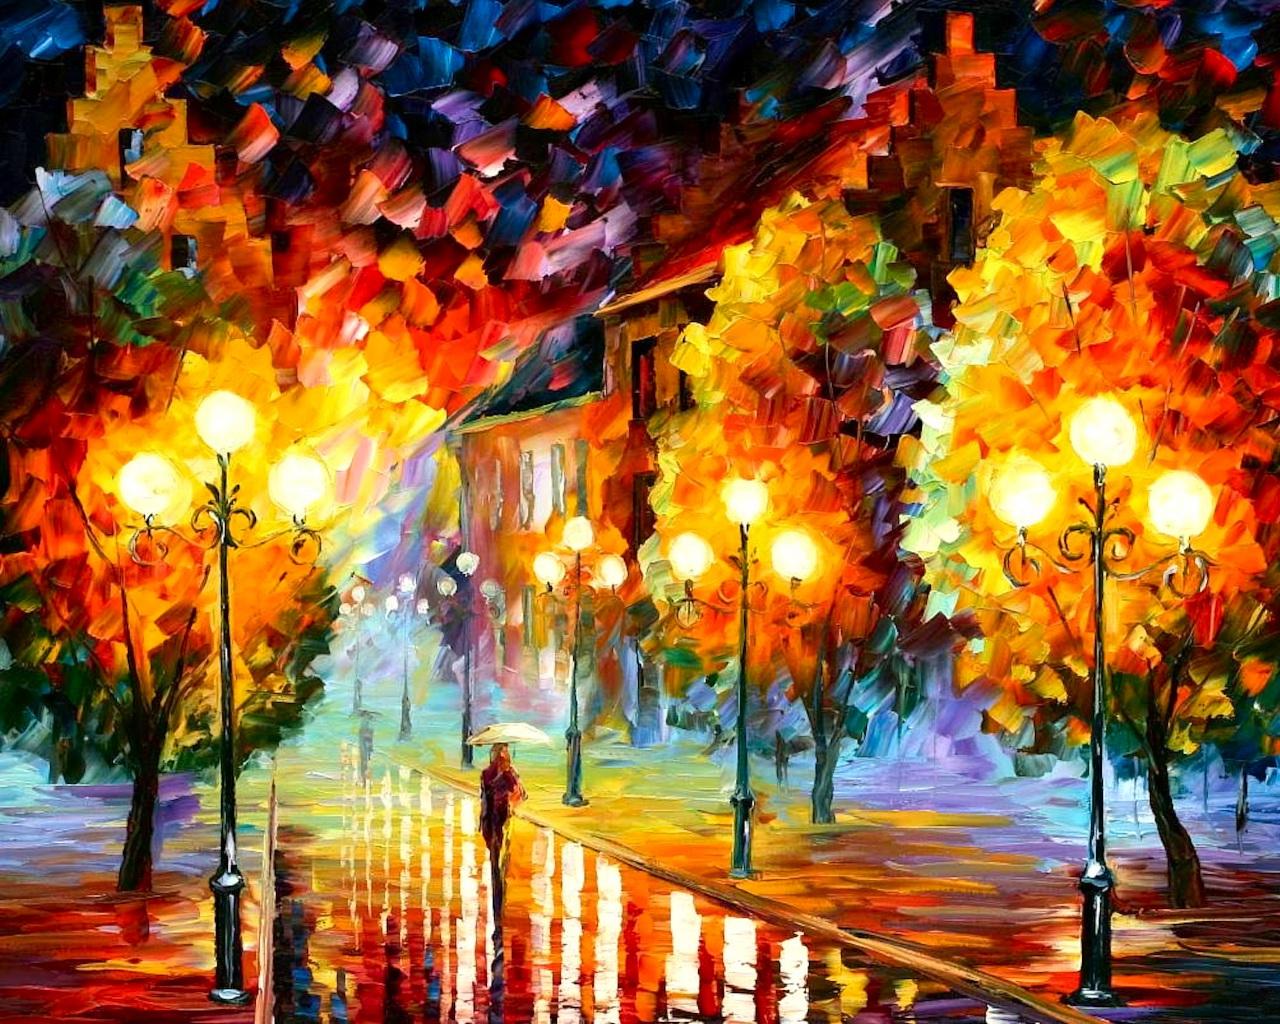 Best Wallpaper Base Best Painting Wallpaper 1 1280x1024